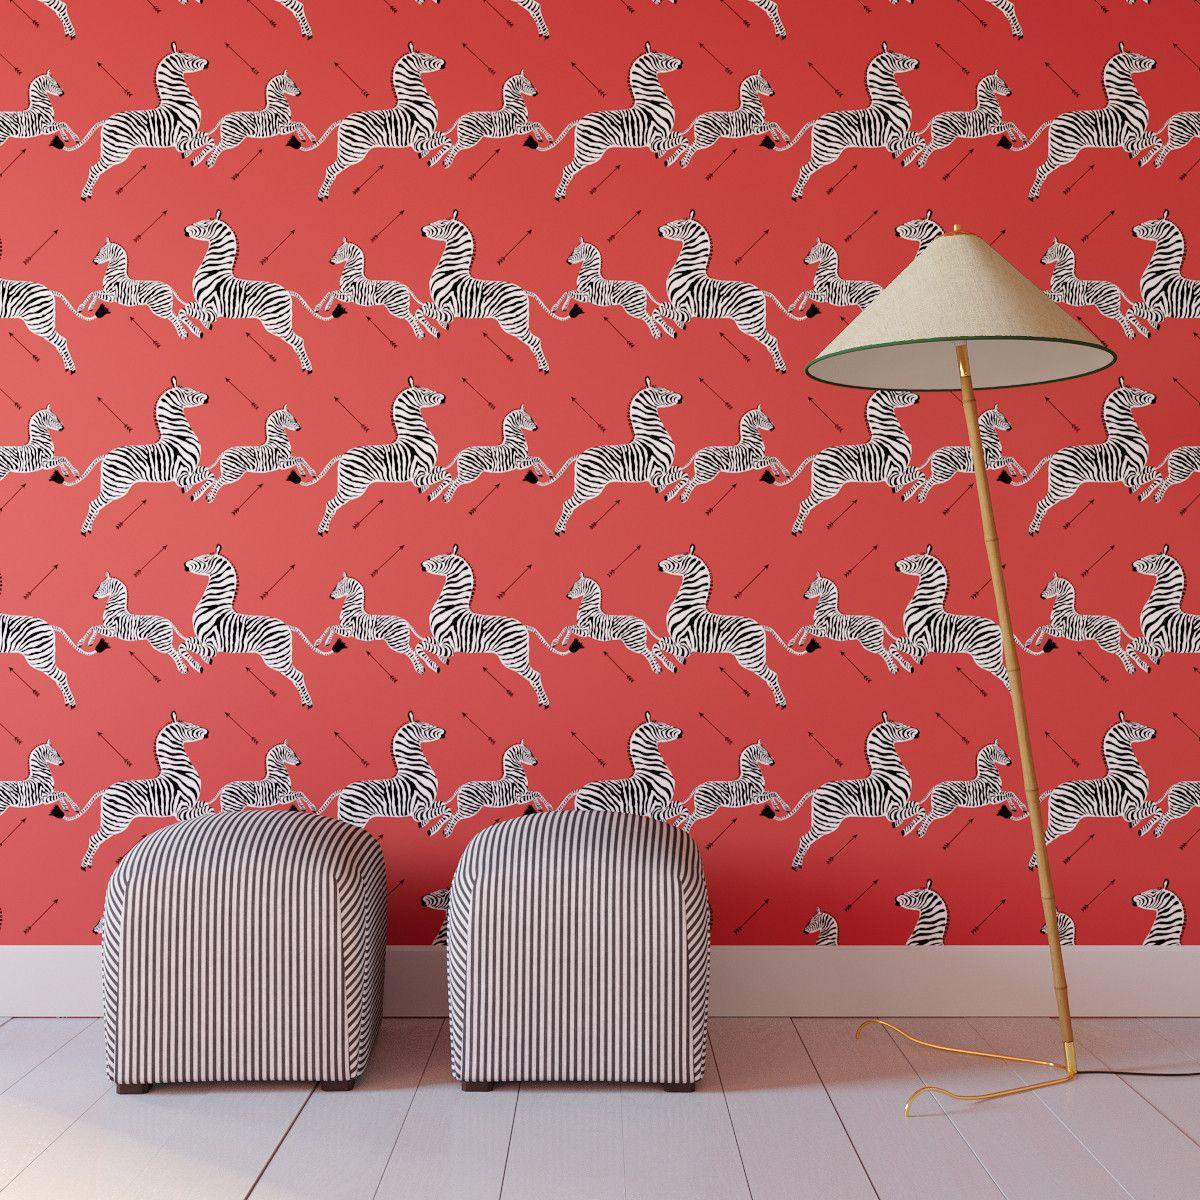 Coral Zebra Upholstered Custom Peel And Stick Wallpaper Roll Zebra Print Wallpaper Peel And Stick Wallpaper Wallpaper Roll